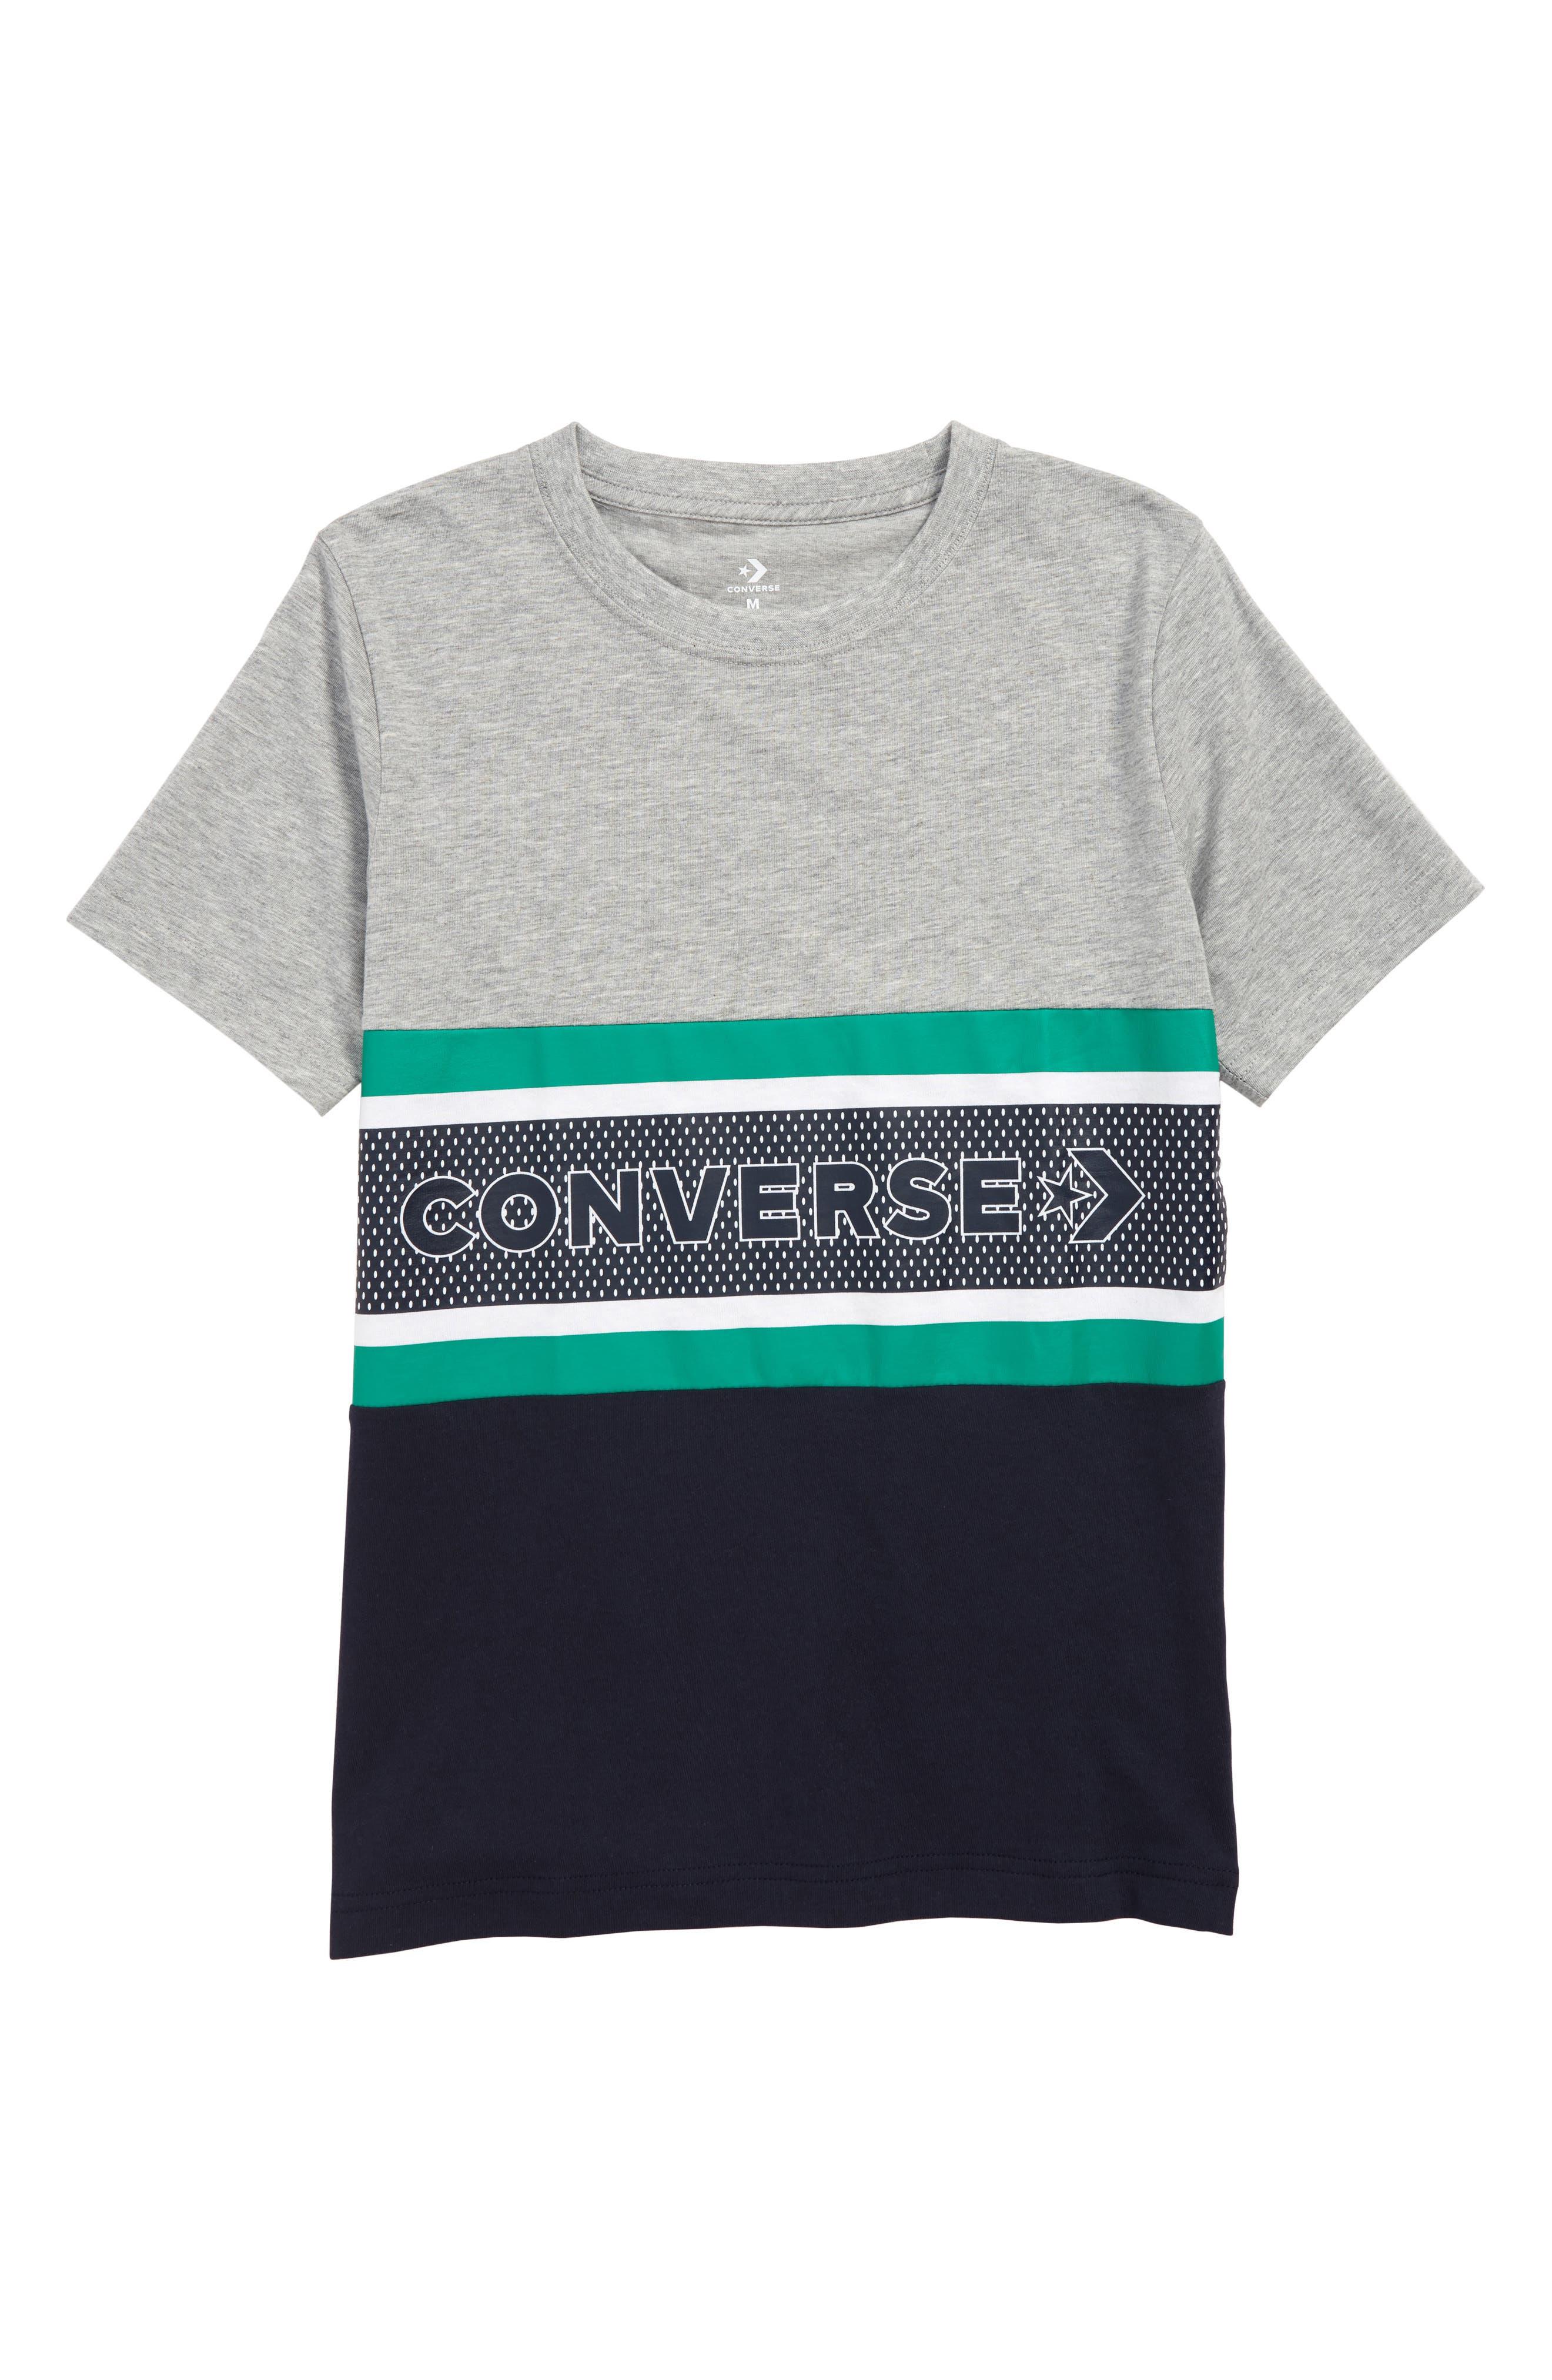 CONVERSE Retro Striped T-Shirt, Main, color, DARK GREY HEATHER